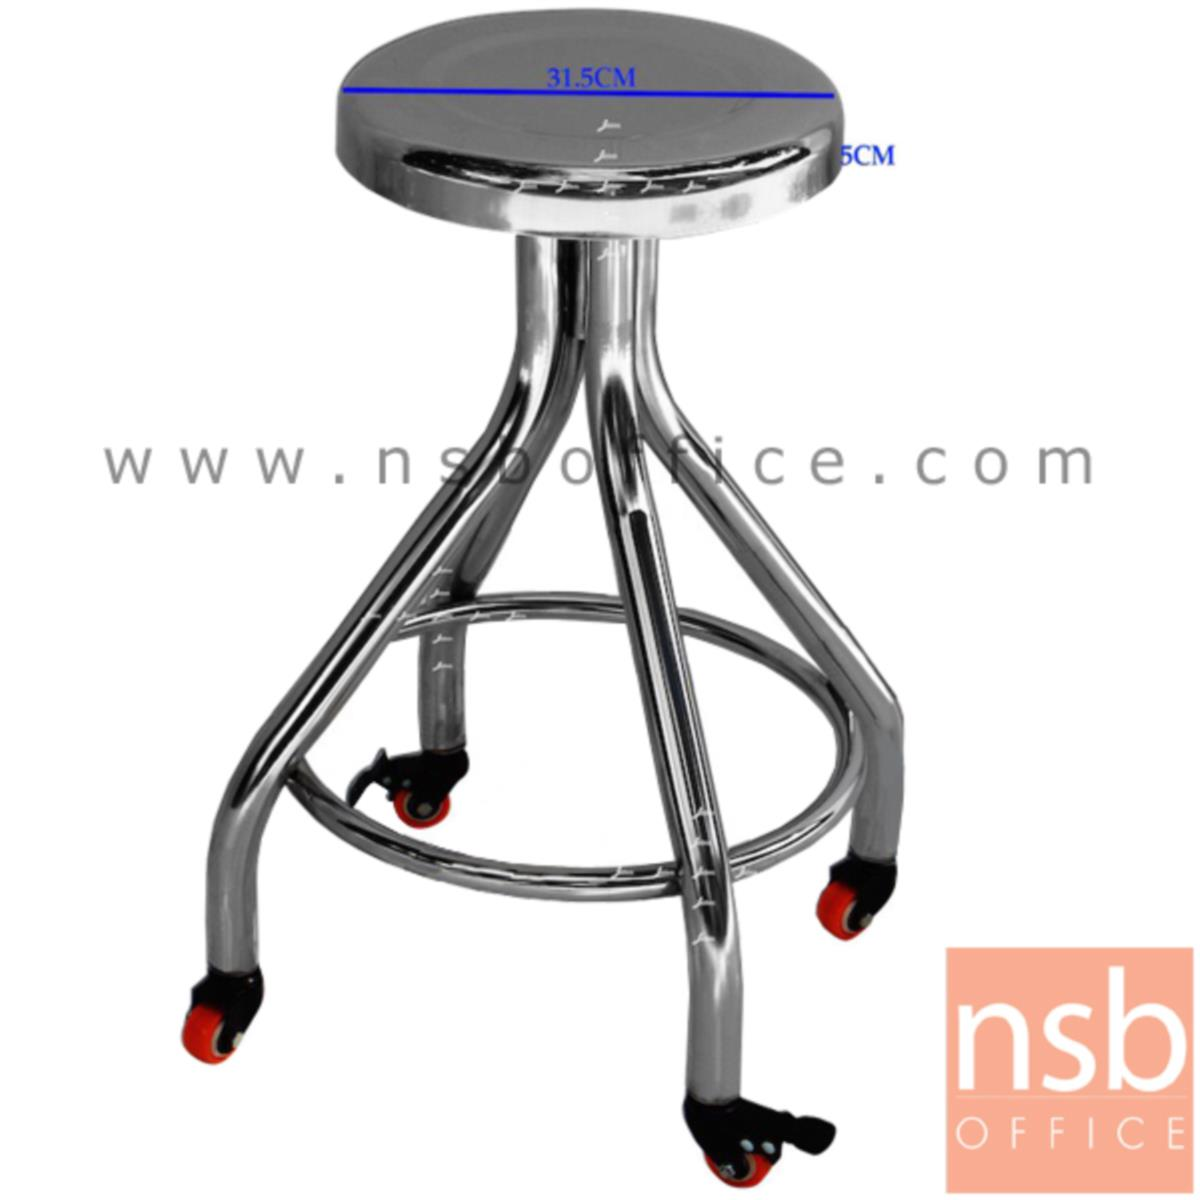 B09A148:เก้าอี้บาร์สตูลที่นั่งกลมล้อเลื่อน รุ่น Azazel (อาซาเซล)  สเตนเลสล้วน